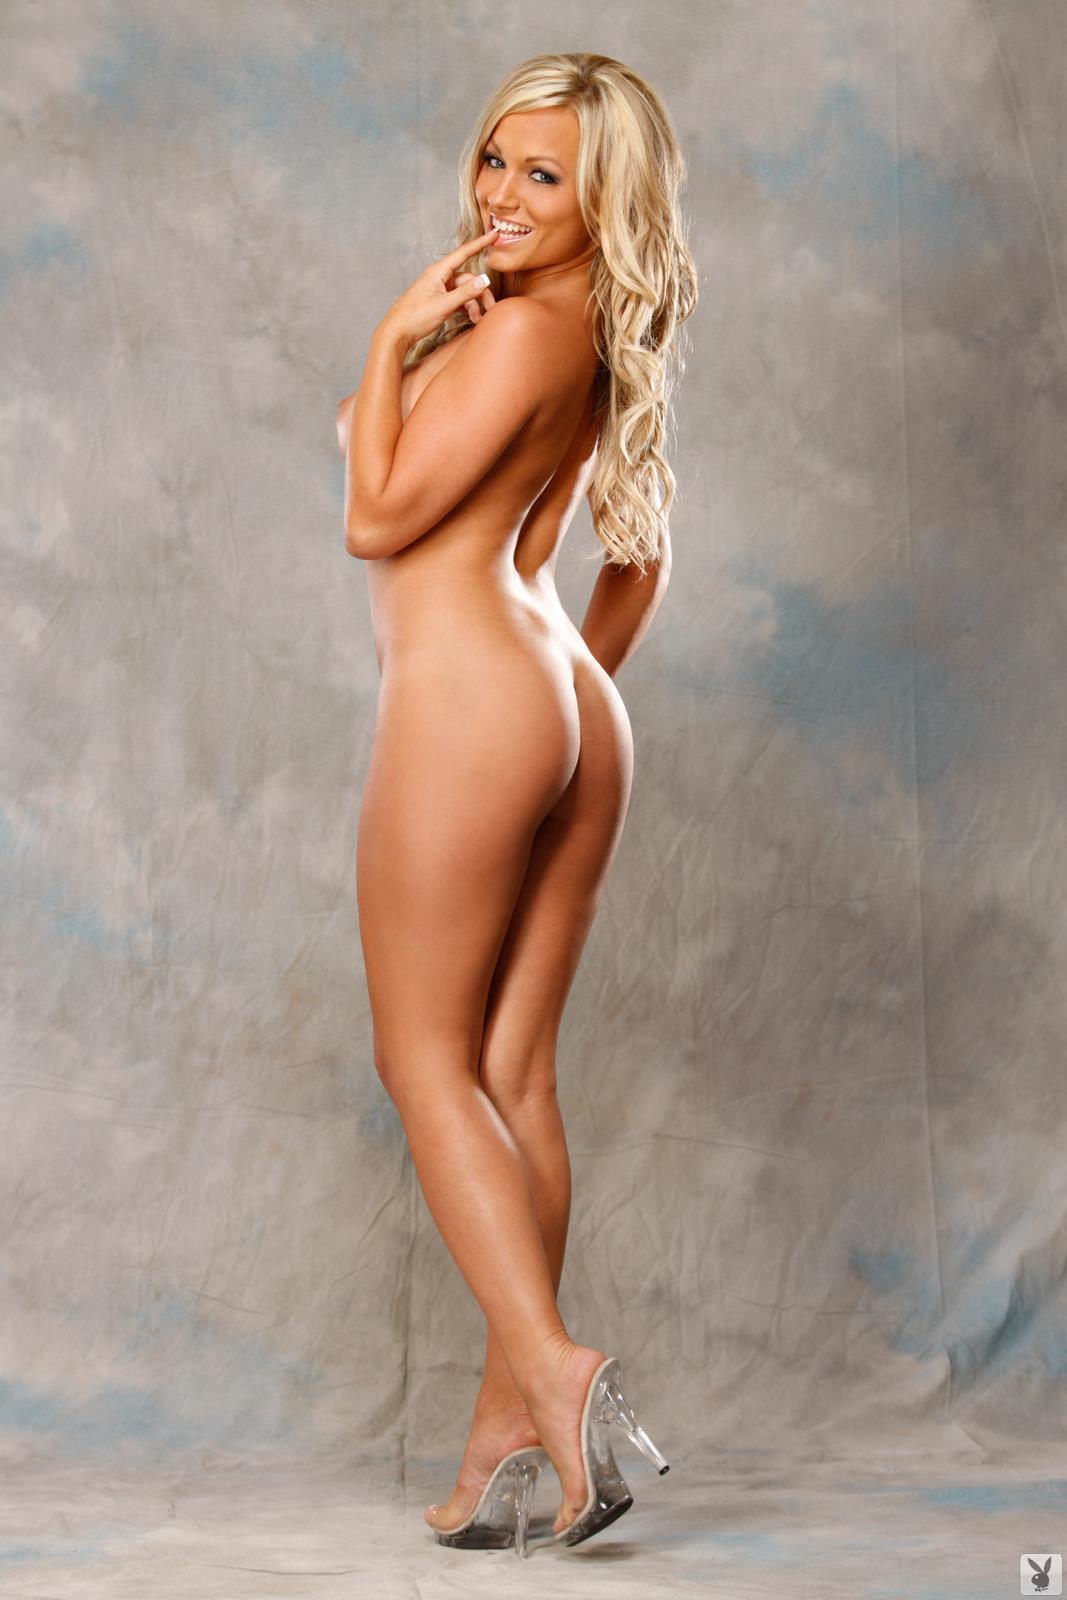 porn-star-heather-knox-pussy-wife-bikini-picture